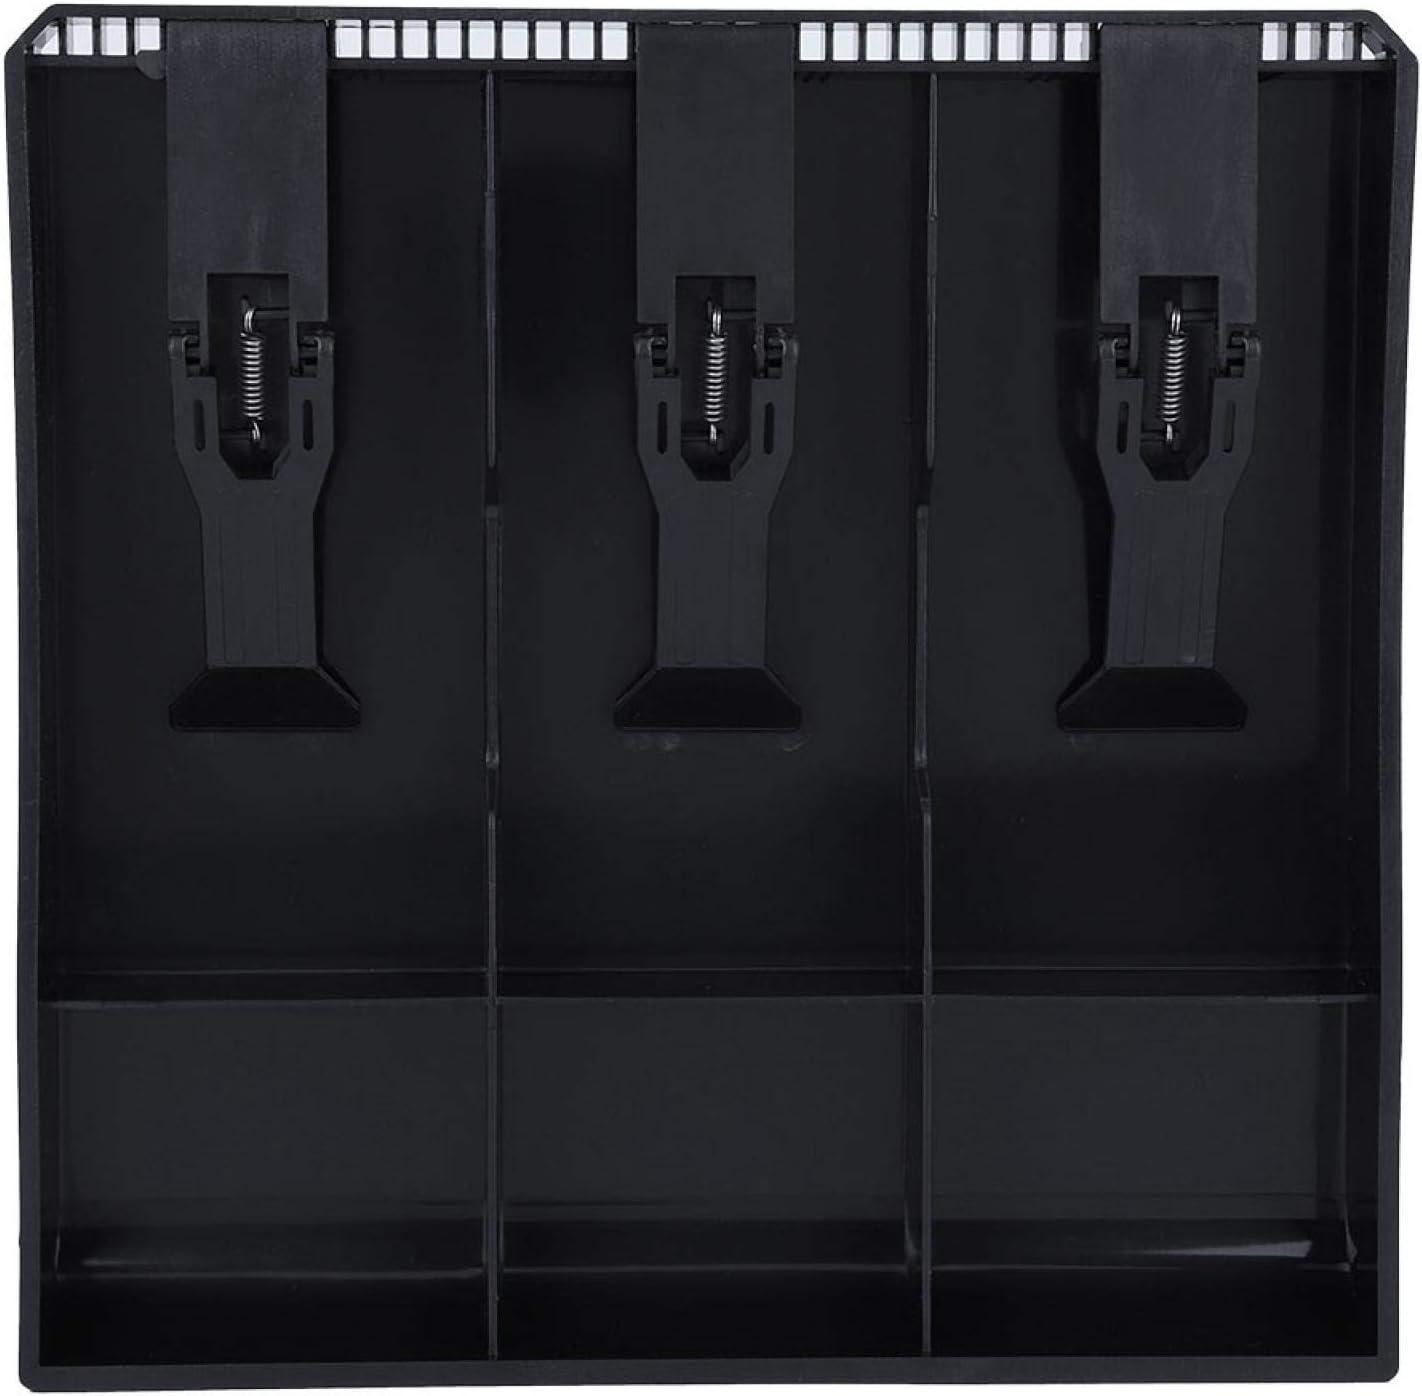 LANTRO JS Opening large release sale - Cash Register Plastic In stock Tray Drawer Insert Regis